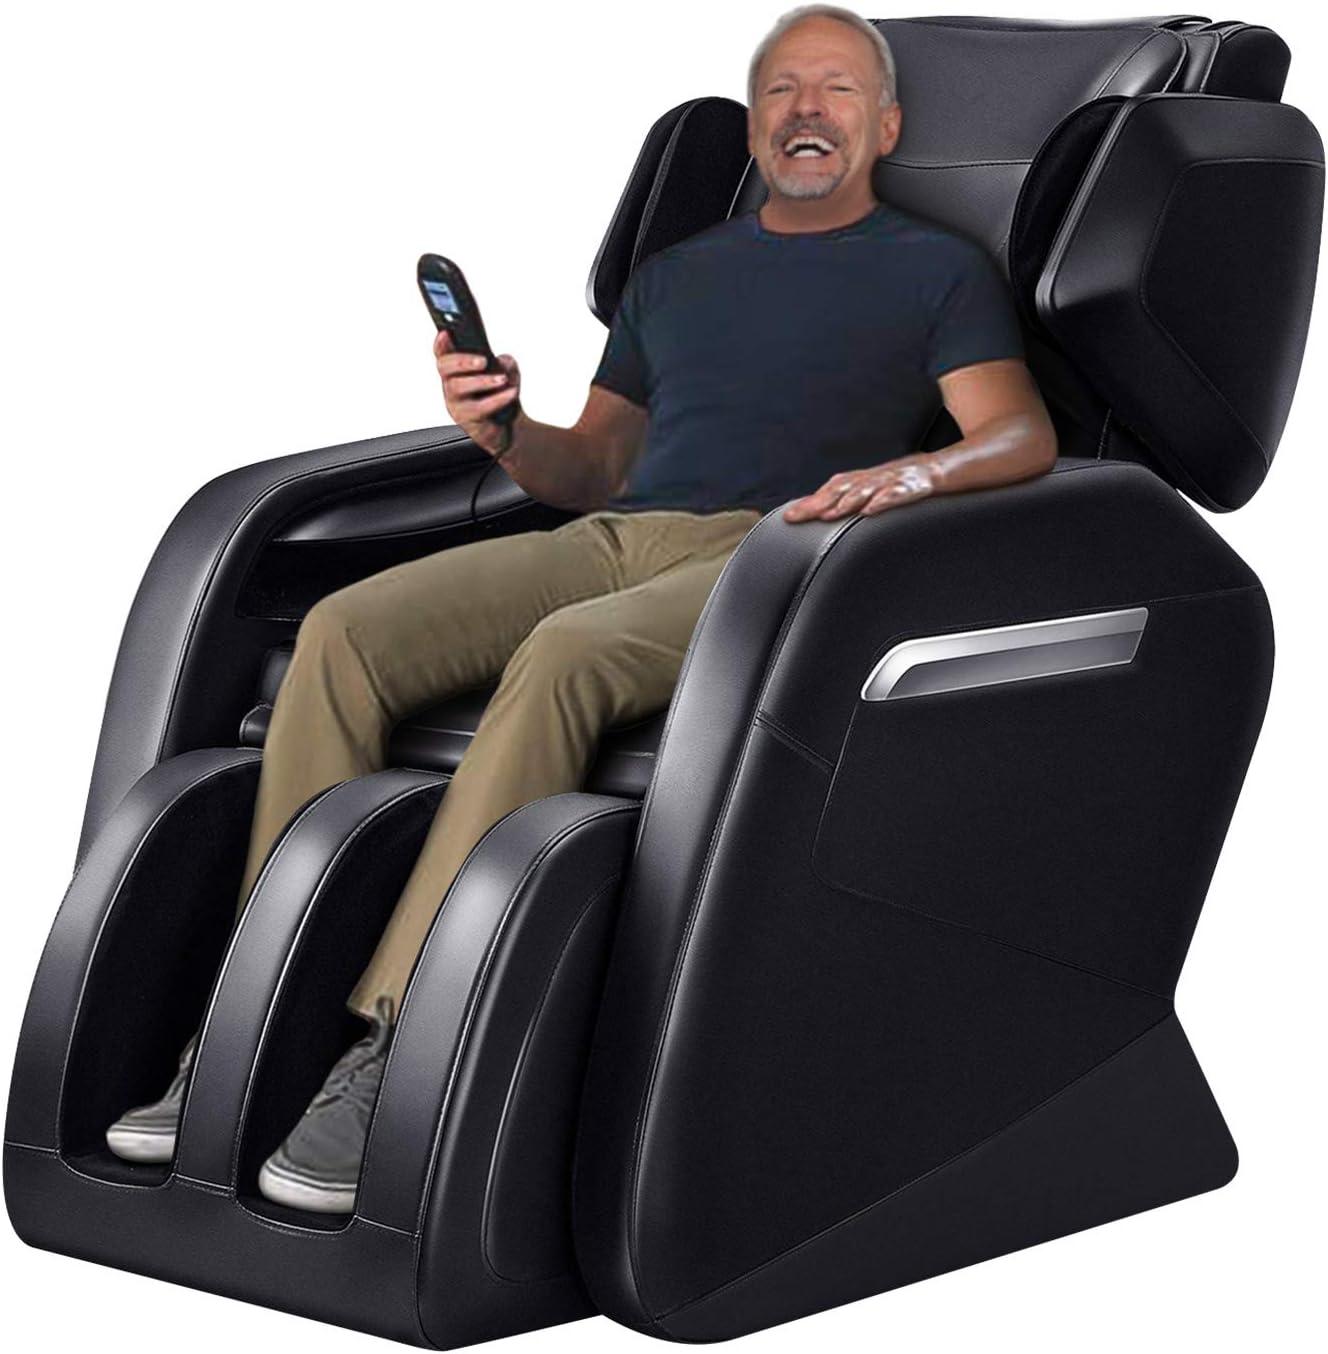 Massage Chair, Zero Gravity Massage Chairs